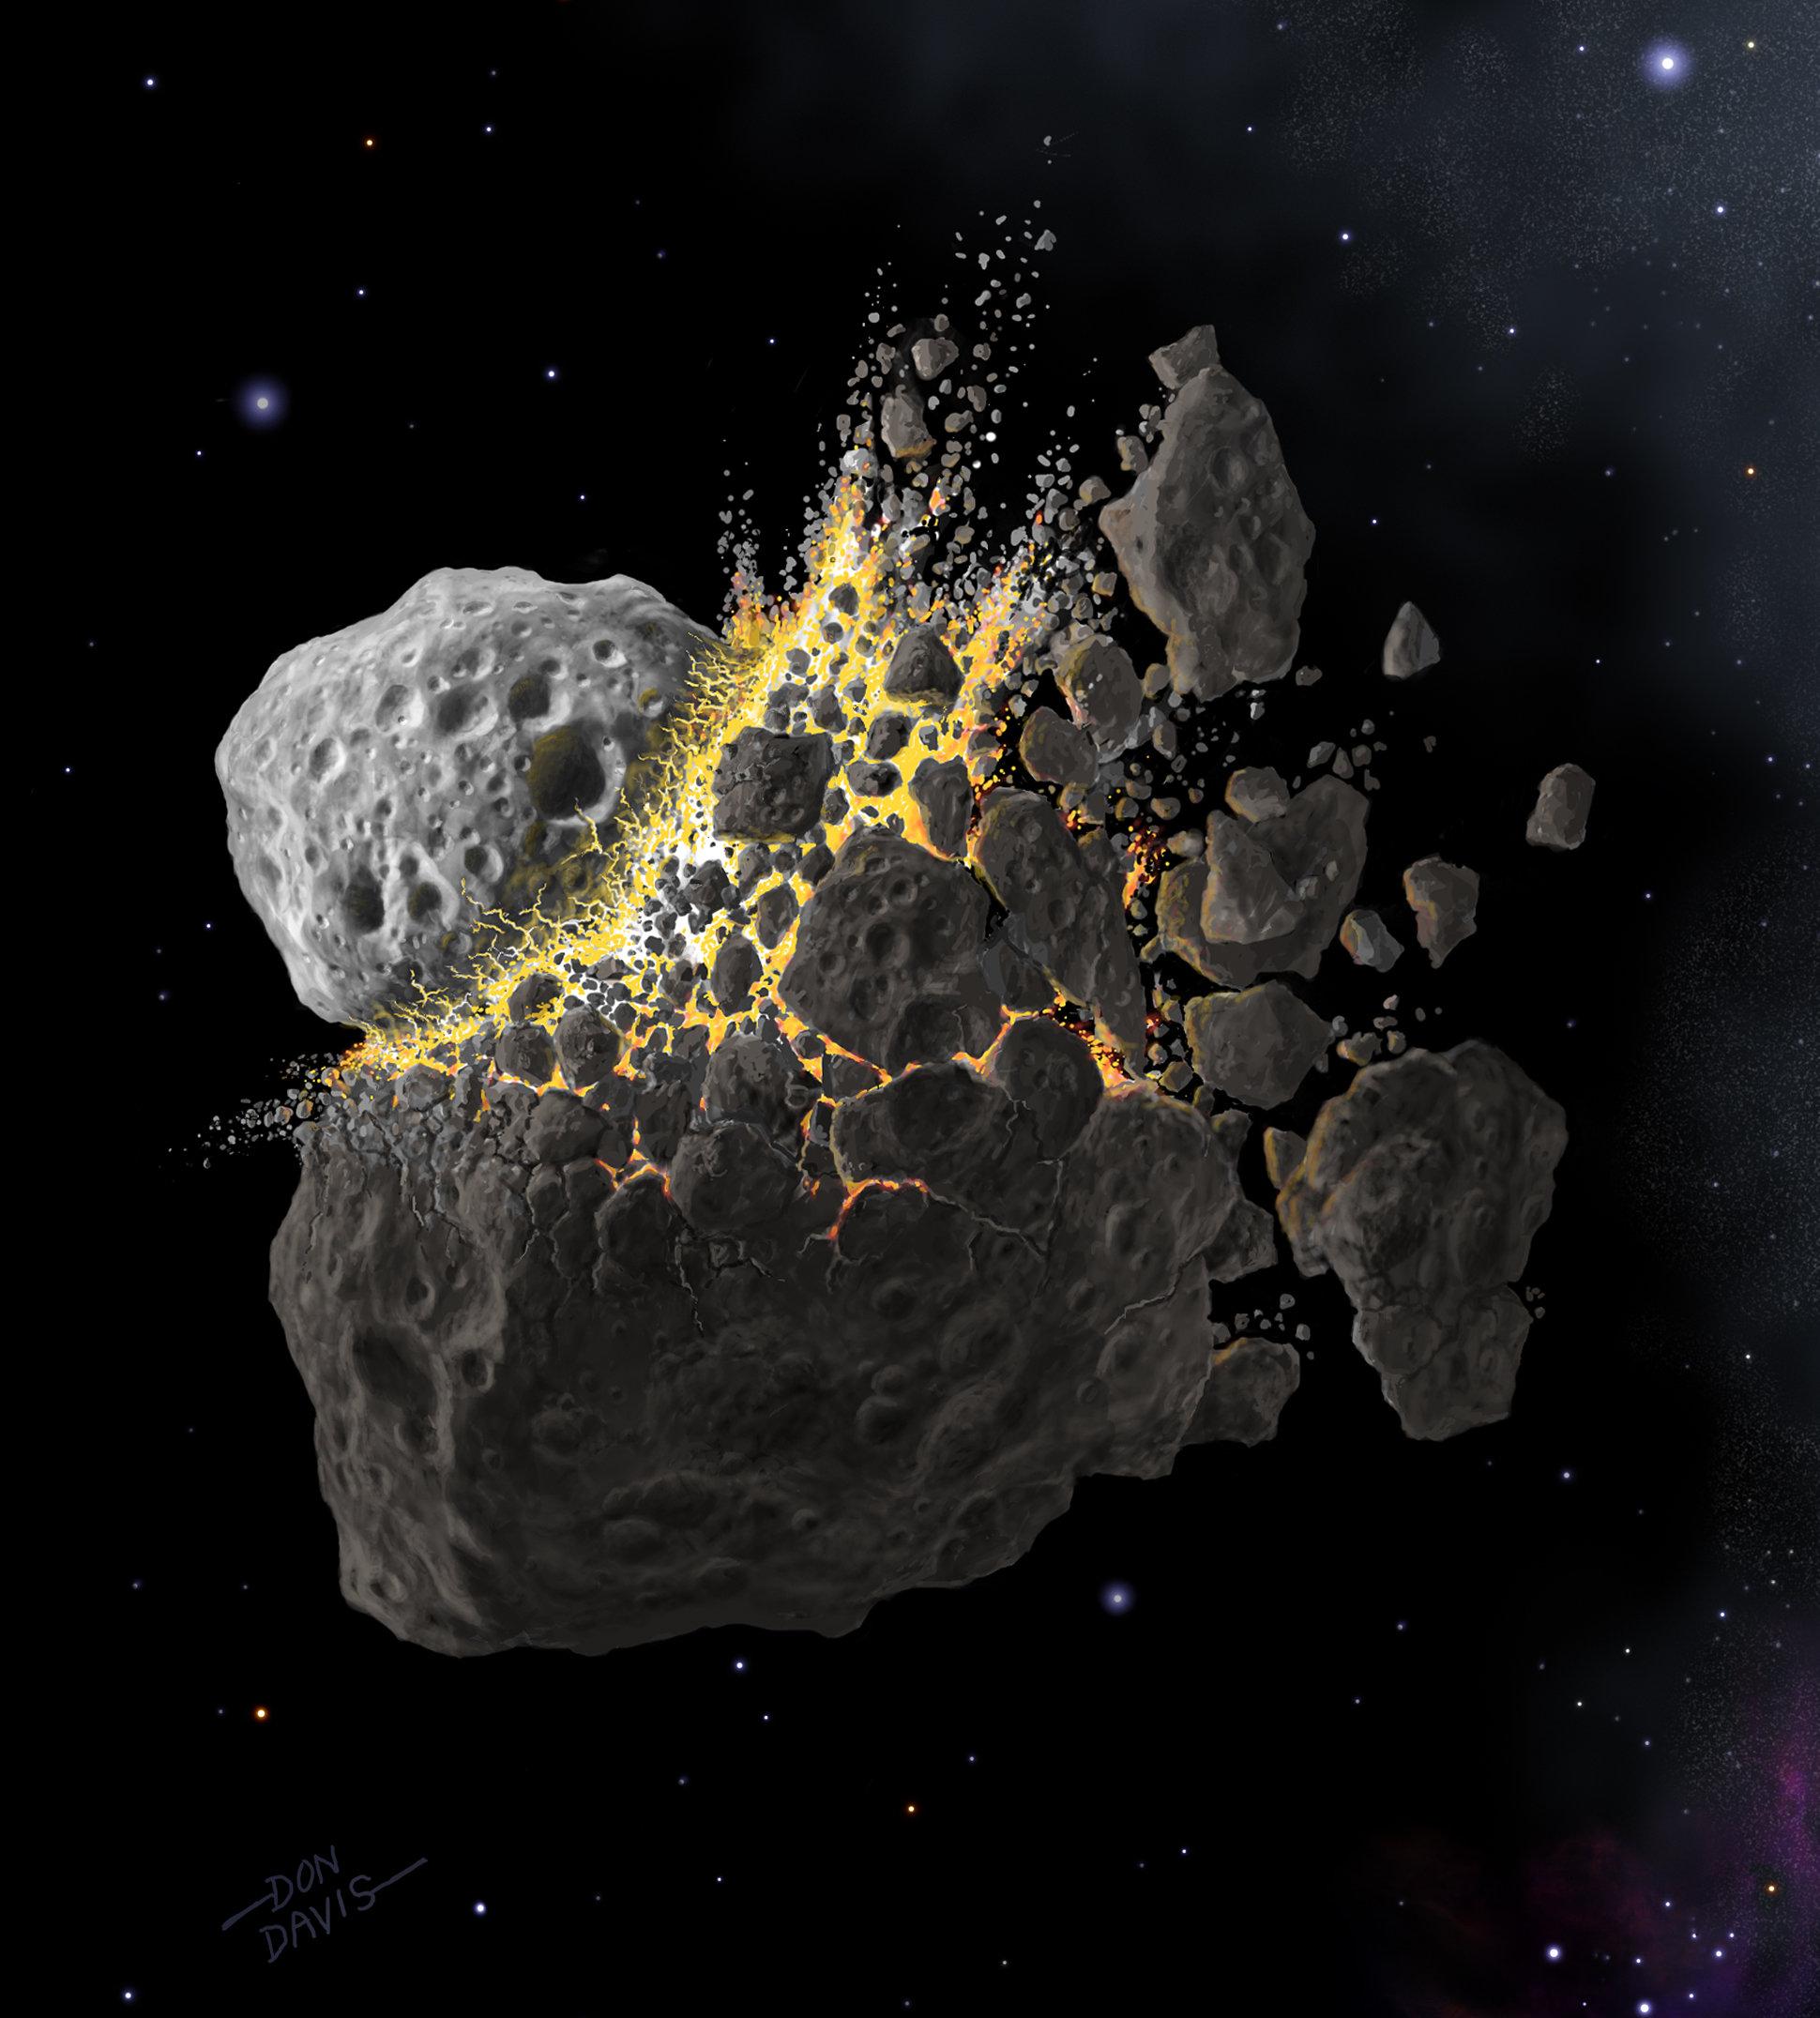 nasa comet collision - HD1440×1173